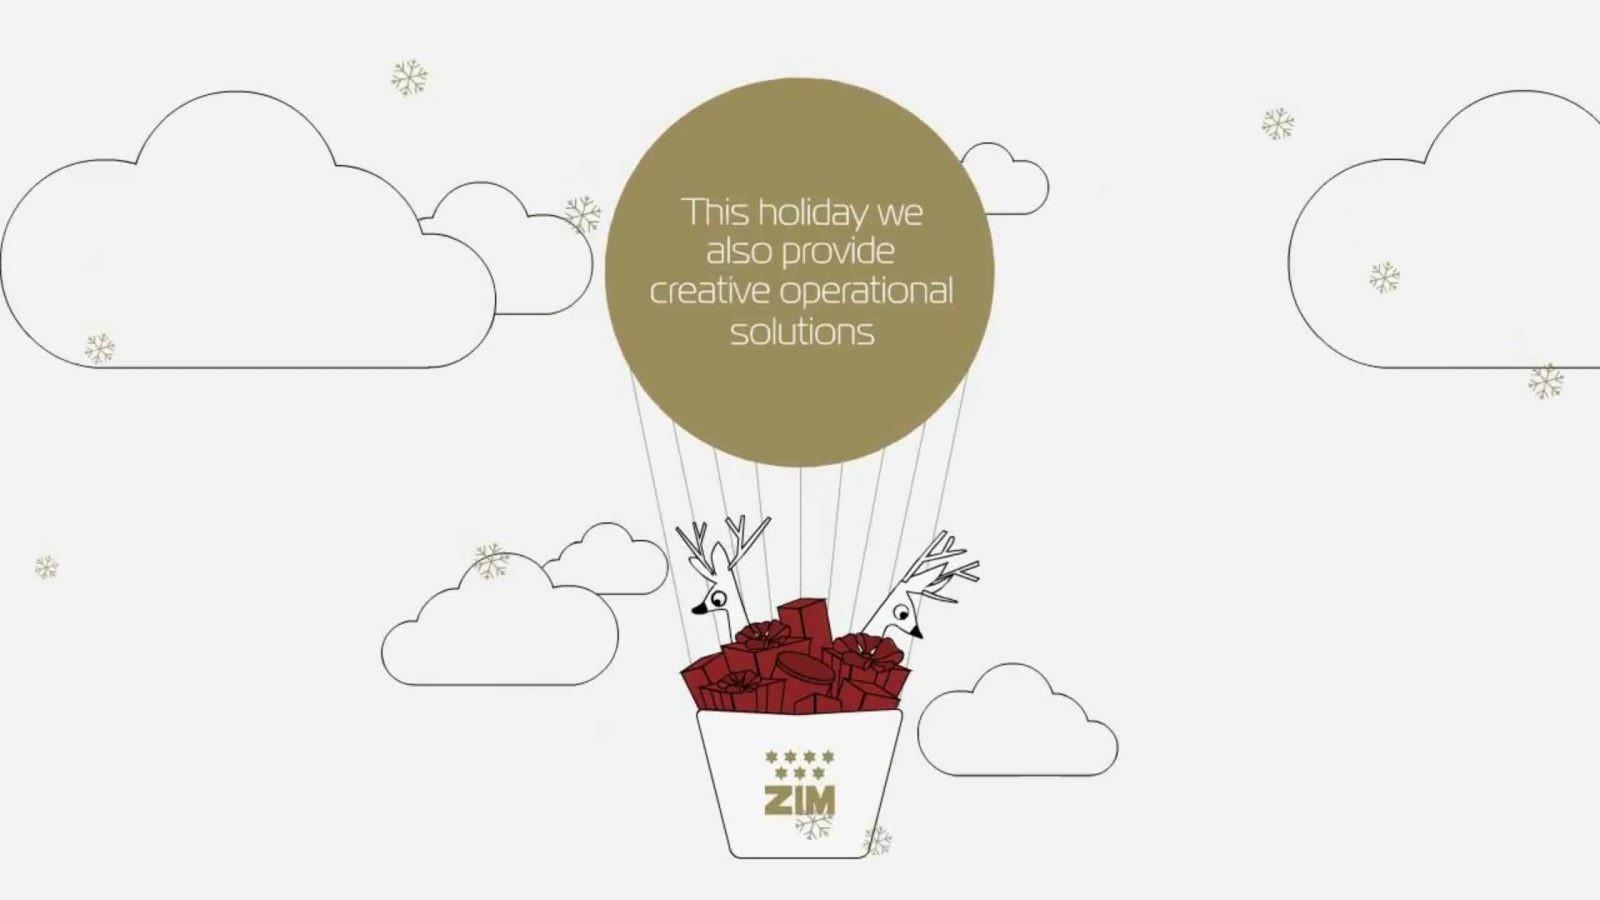 Web3D - הפקת סרטון אנימציה ותדמית - zim